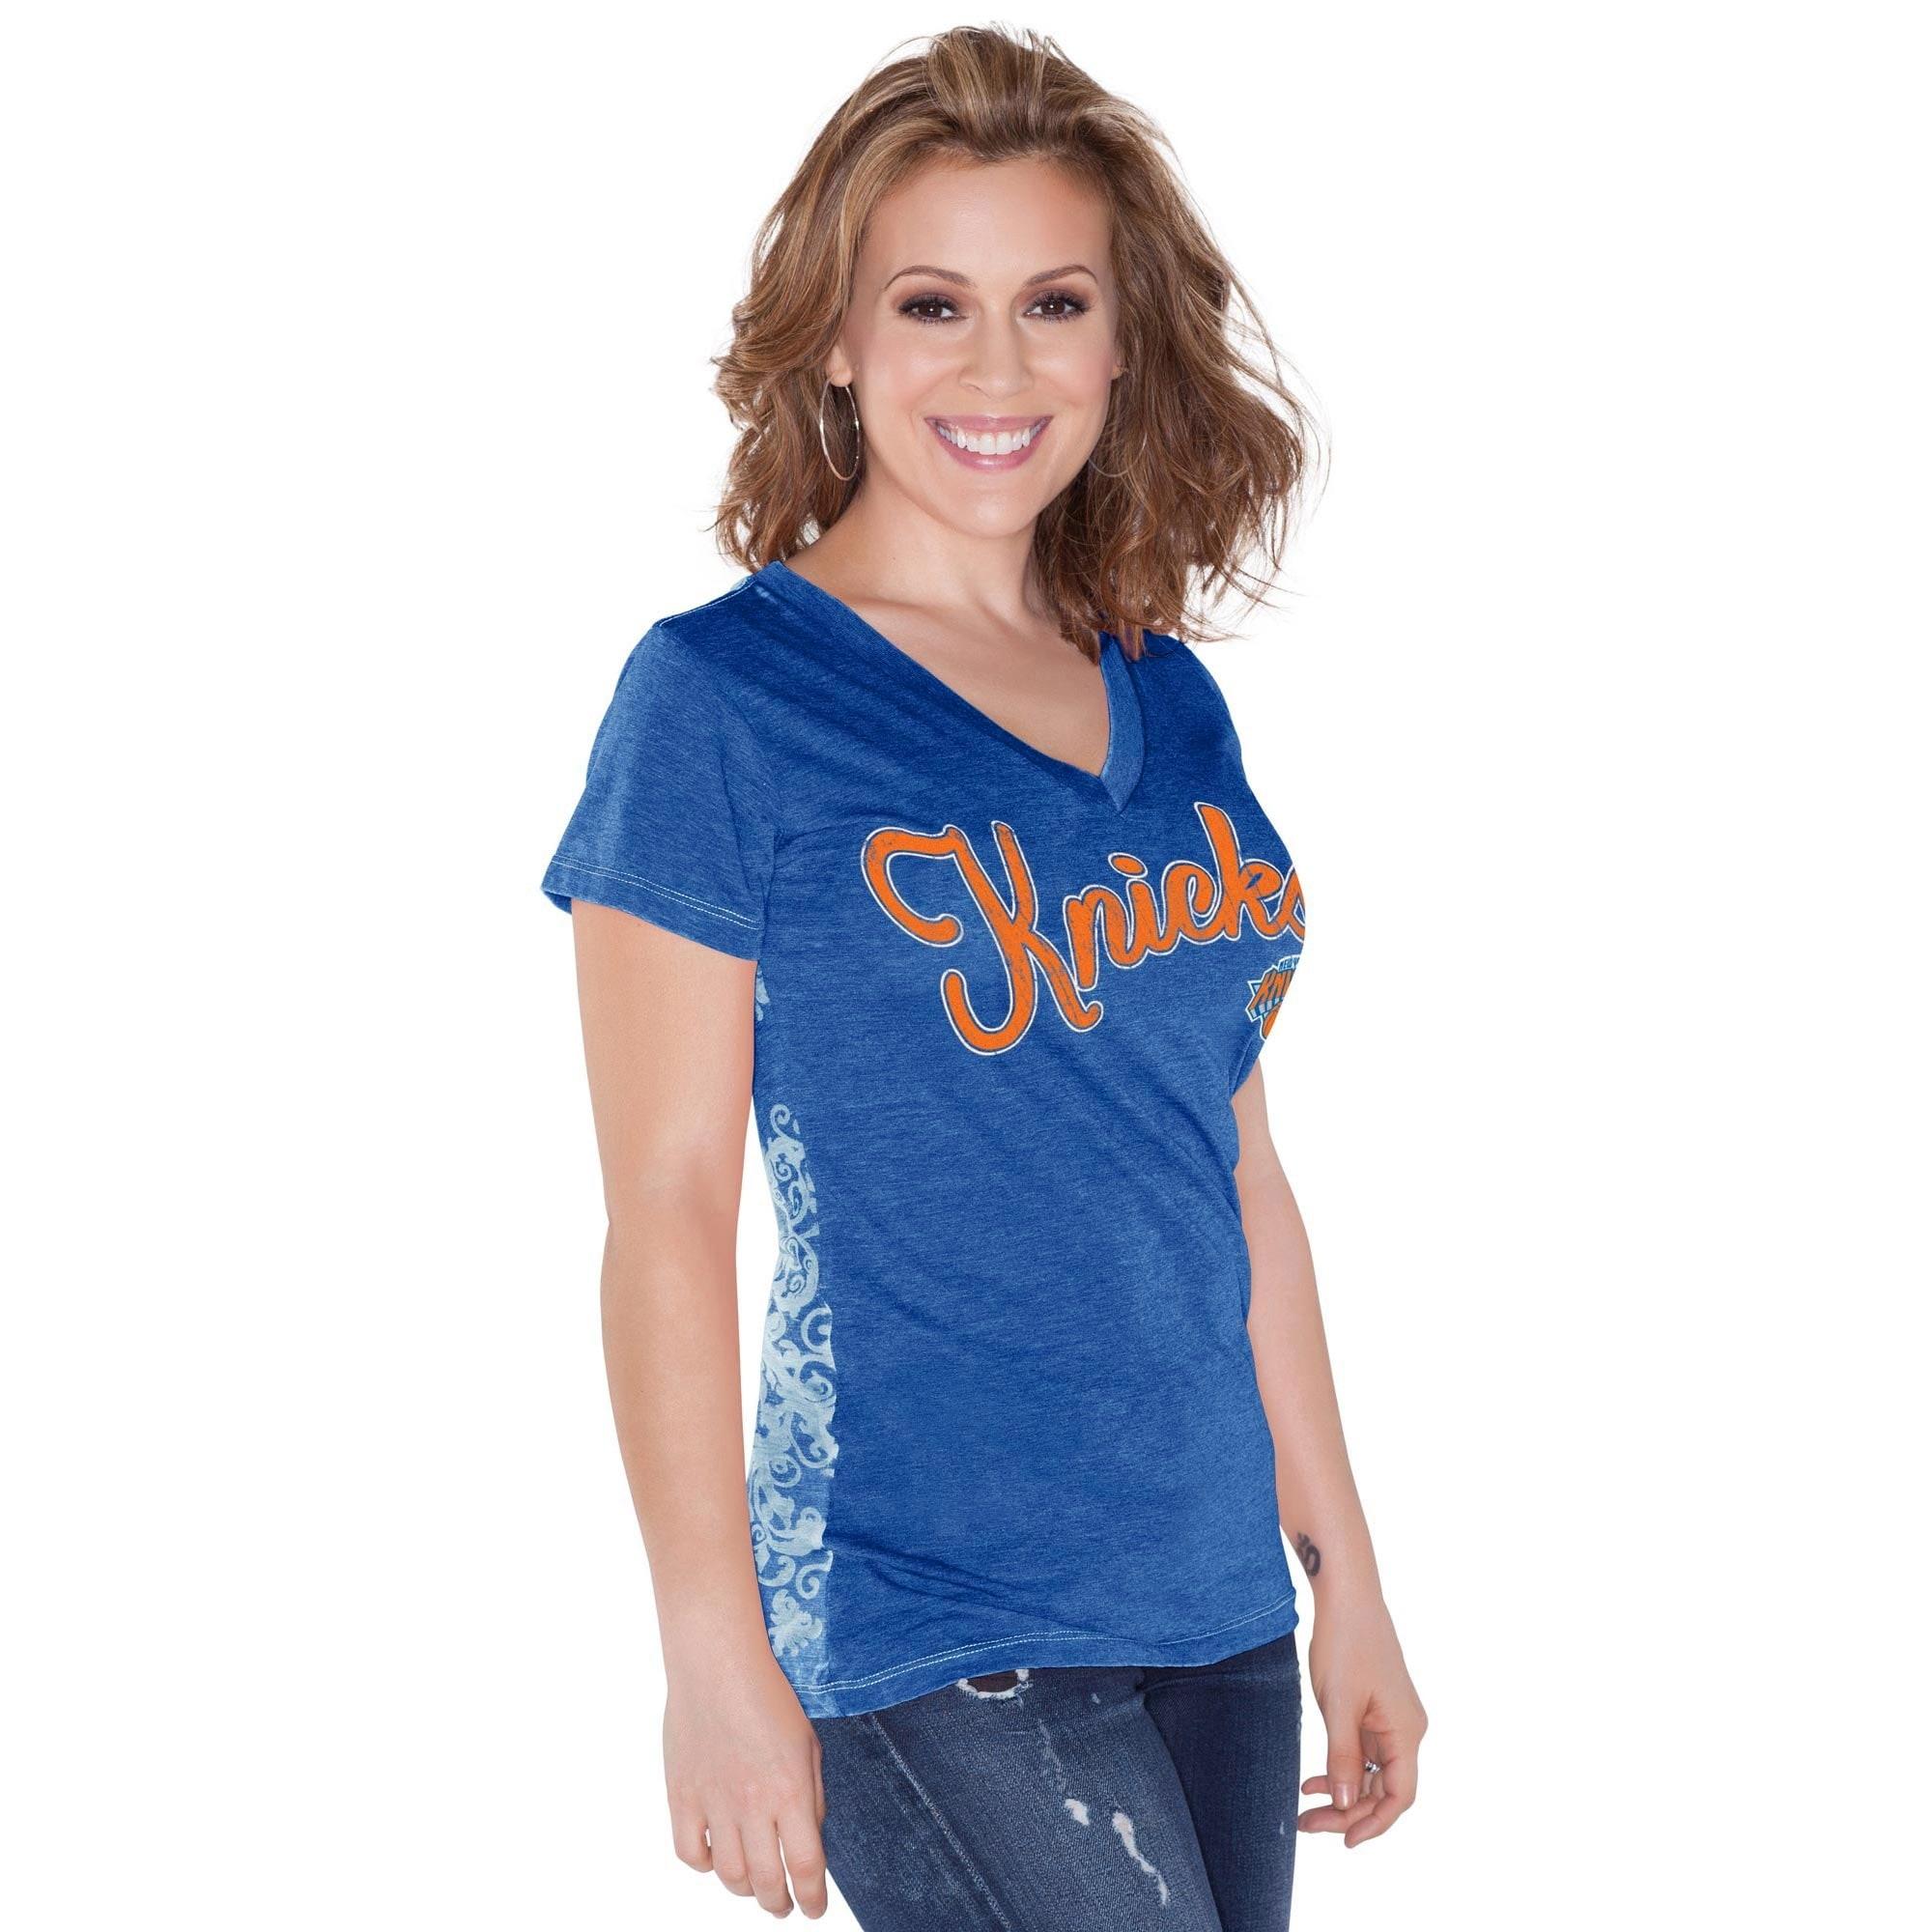 New York Knicks Touch by Alyssa Milano Women's Audrey V-Neck T-Shirt - Royal Blue